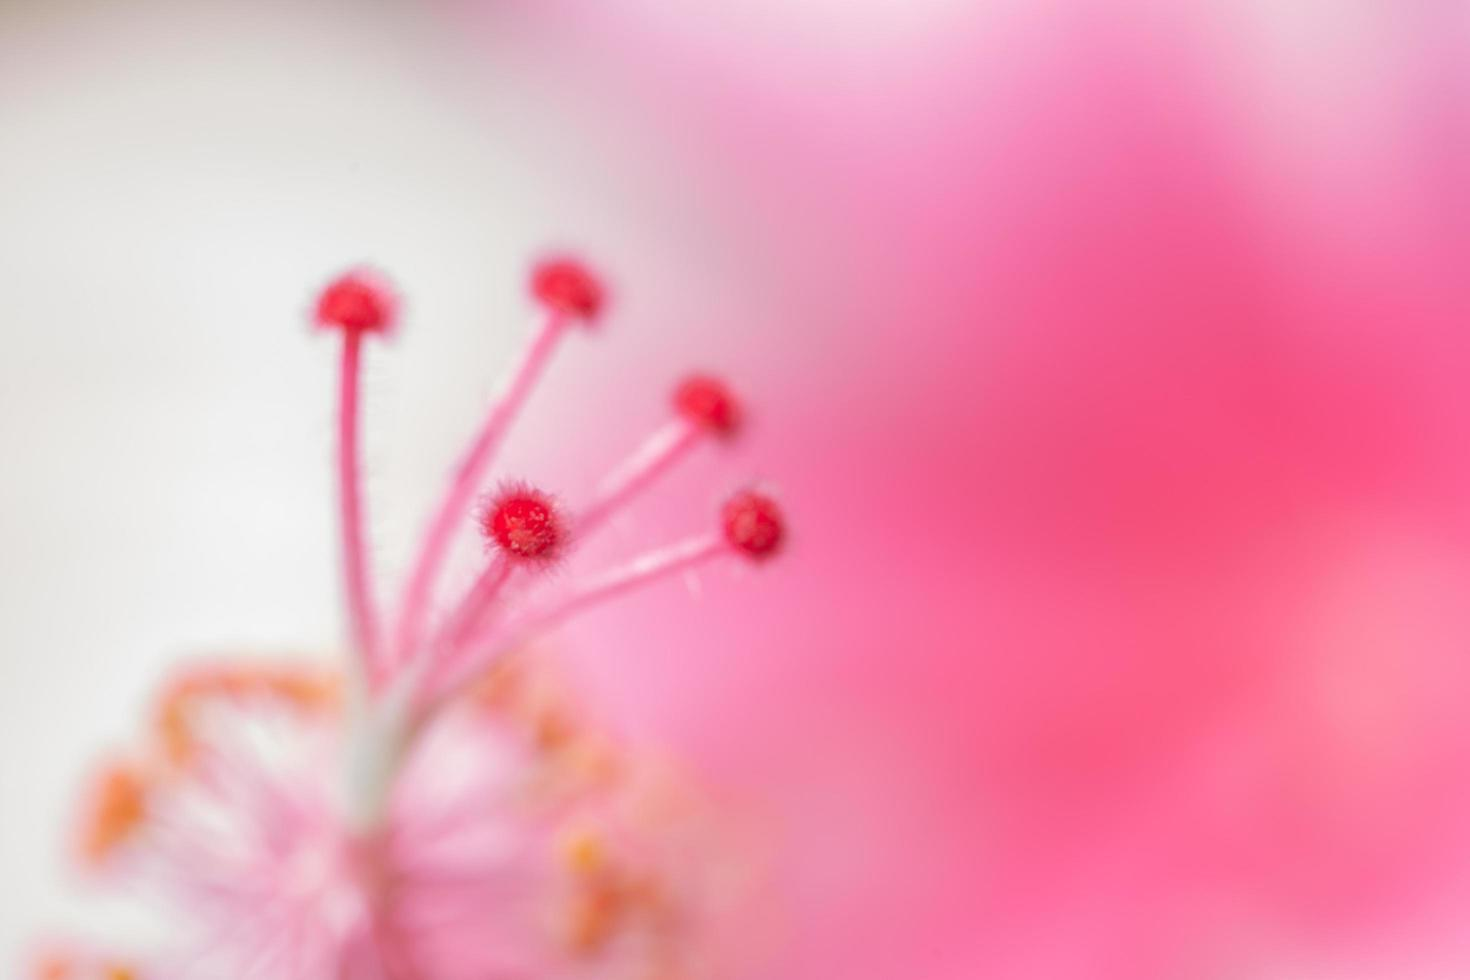 primer plano de polen rosa, fondo borroso foto